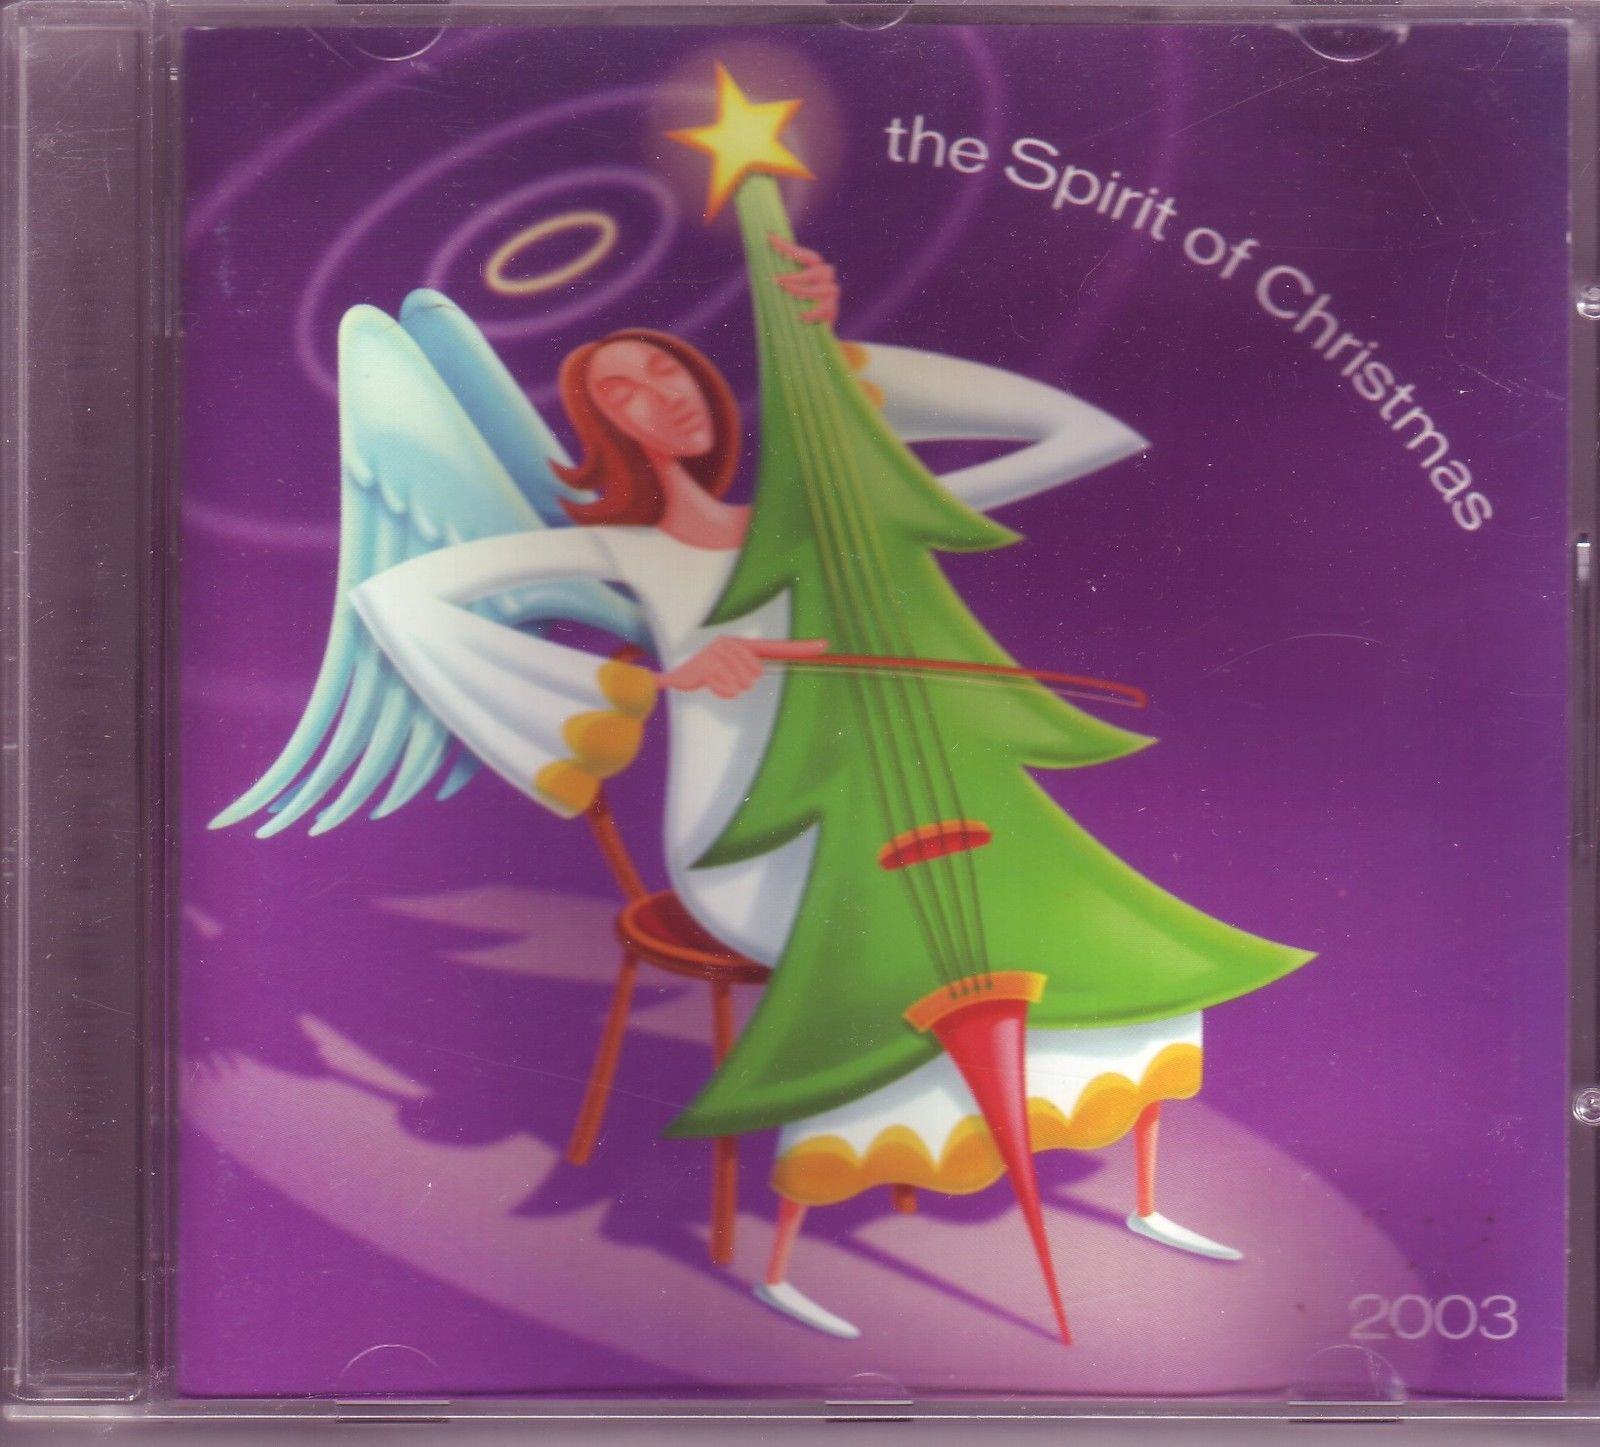 The Spirit of Christmas 2003